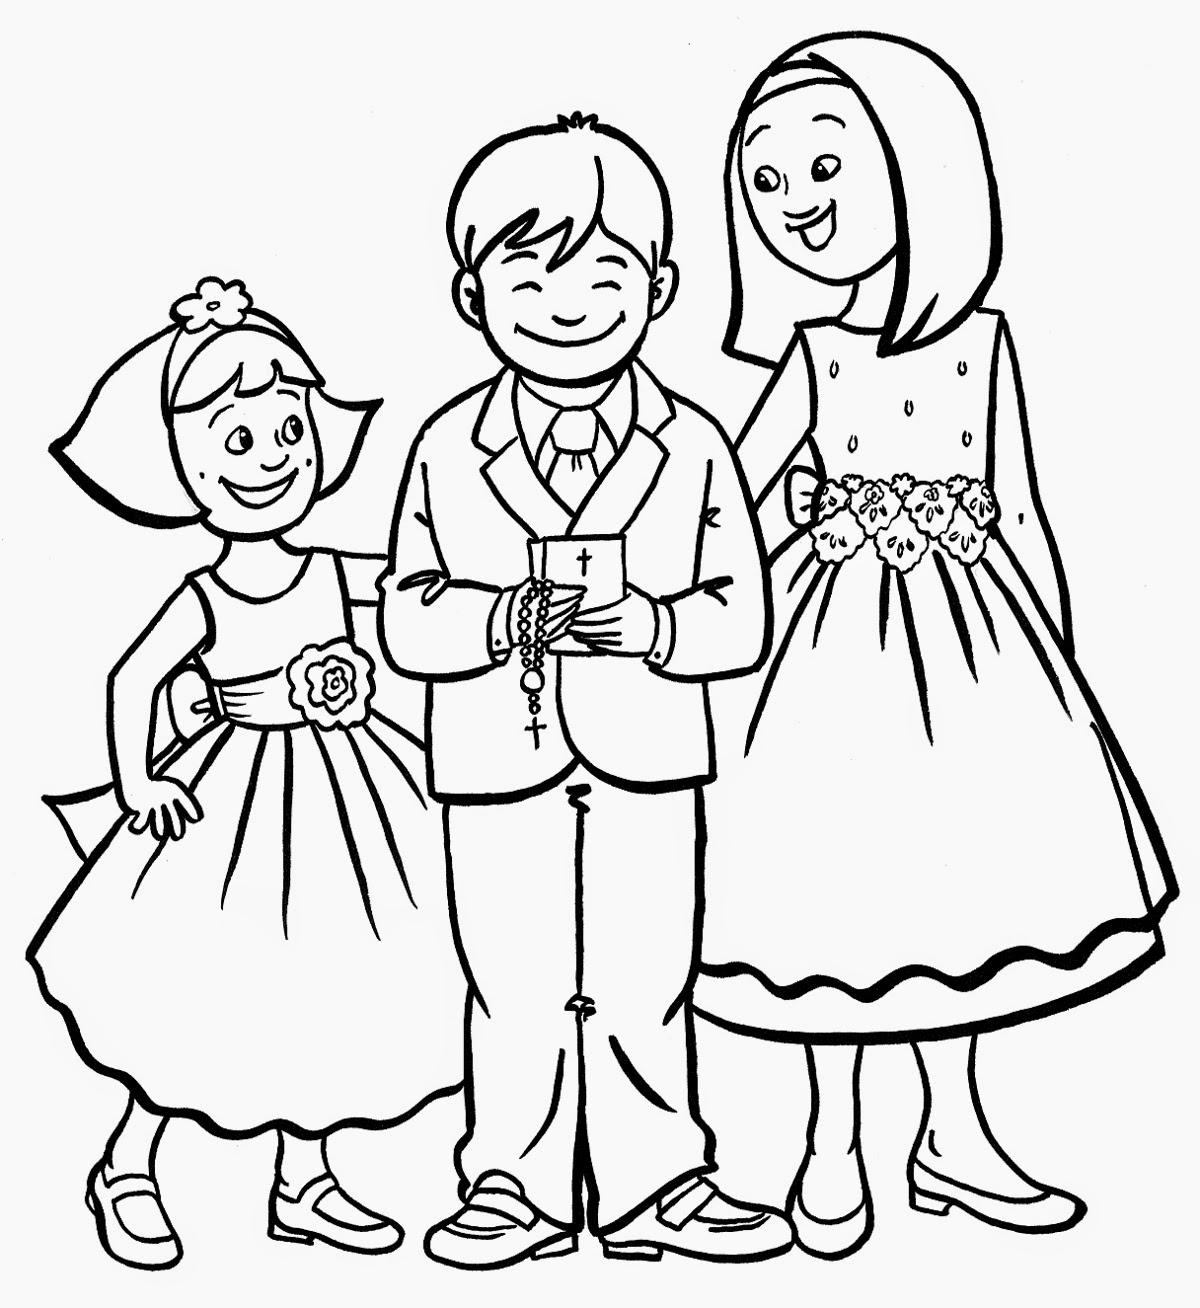 Top Gambar Sketsa Keluargaku